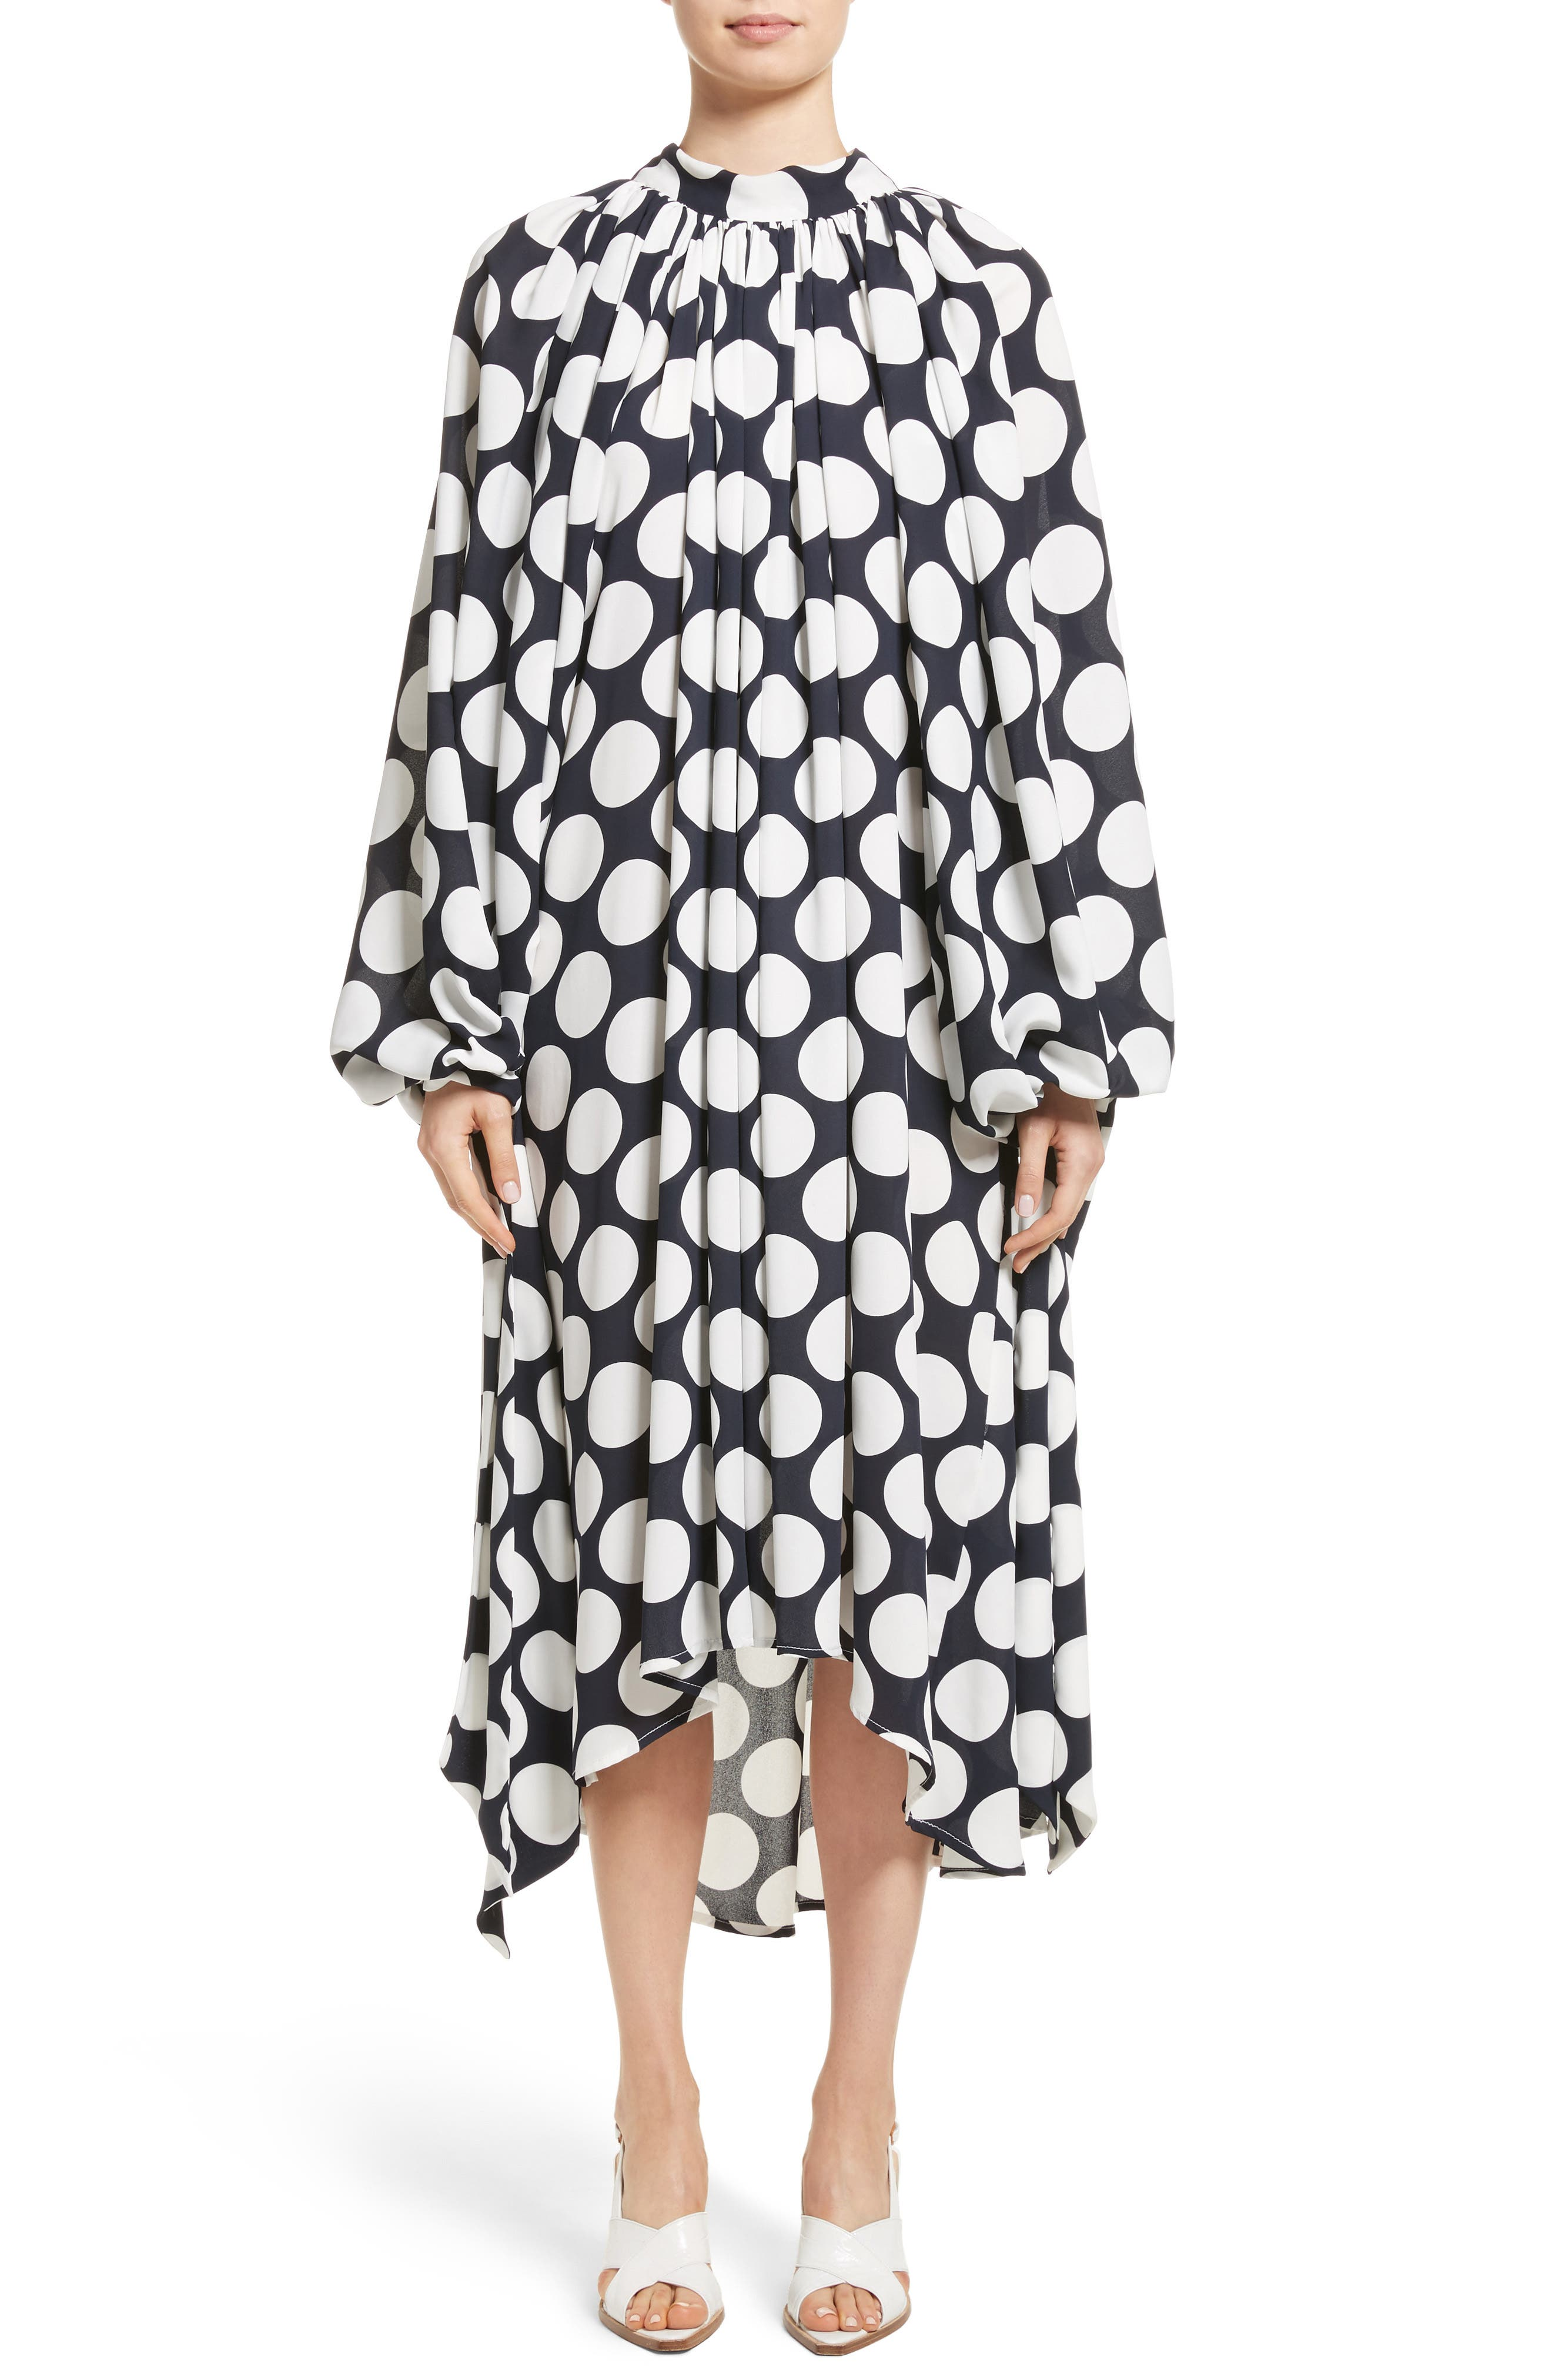 Giant Polka Dot Gathered Collar Dress,                             Main thumbnail 1, color,                             410